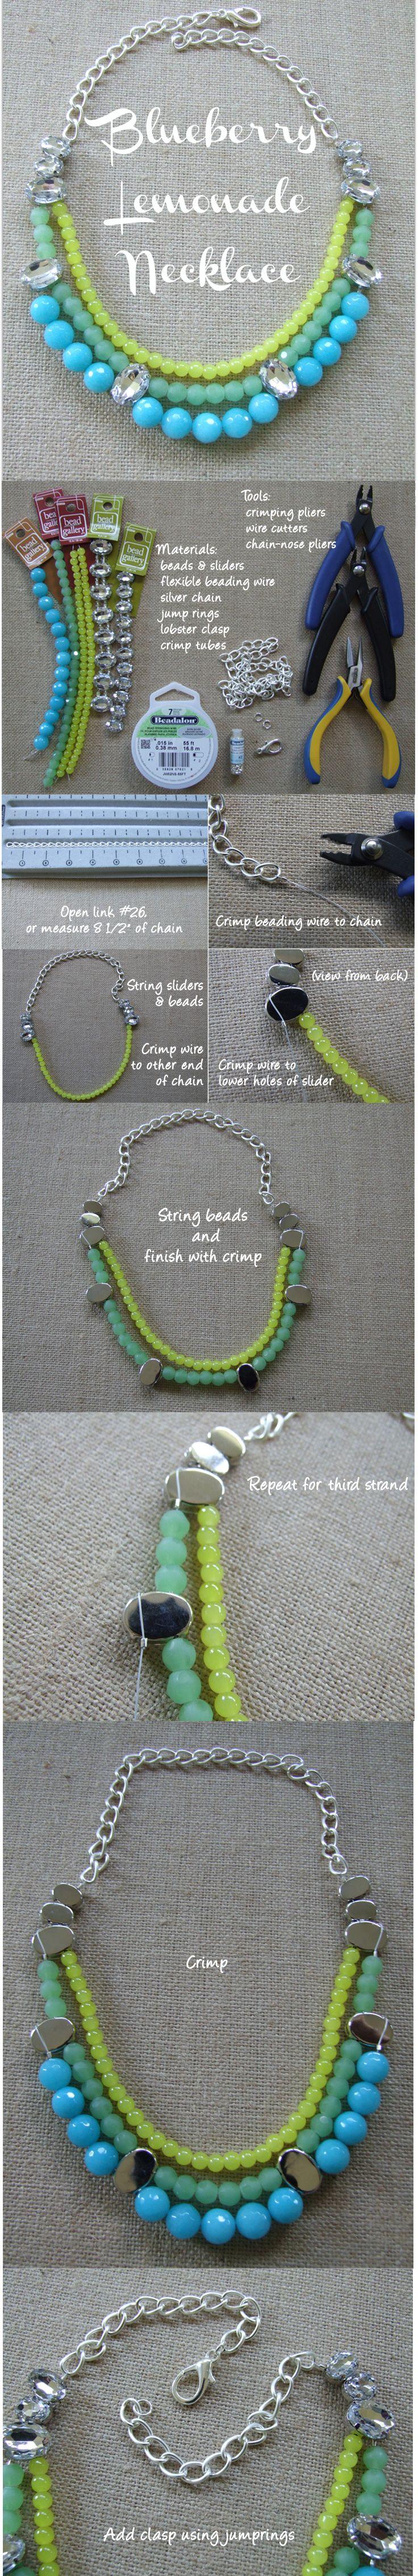 DIY Blueberry Lemonade Fashion Necklace (minus the bling)